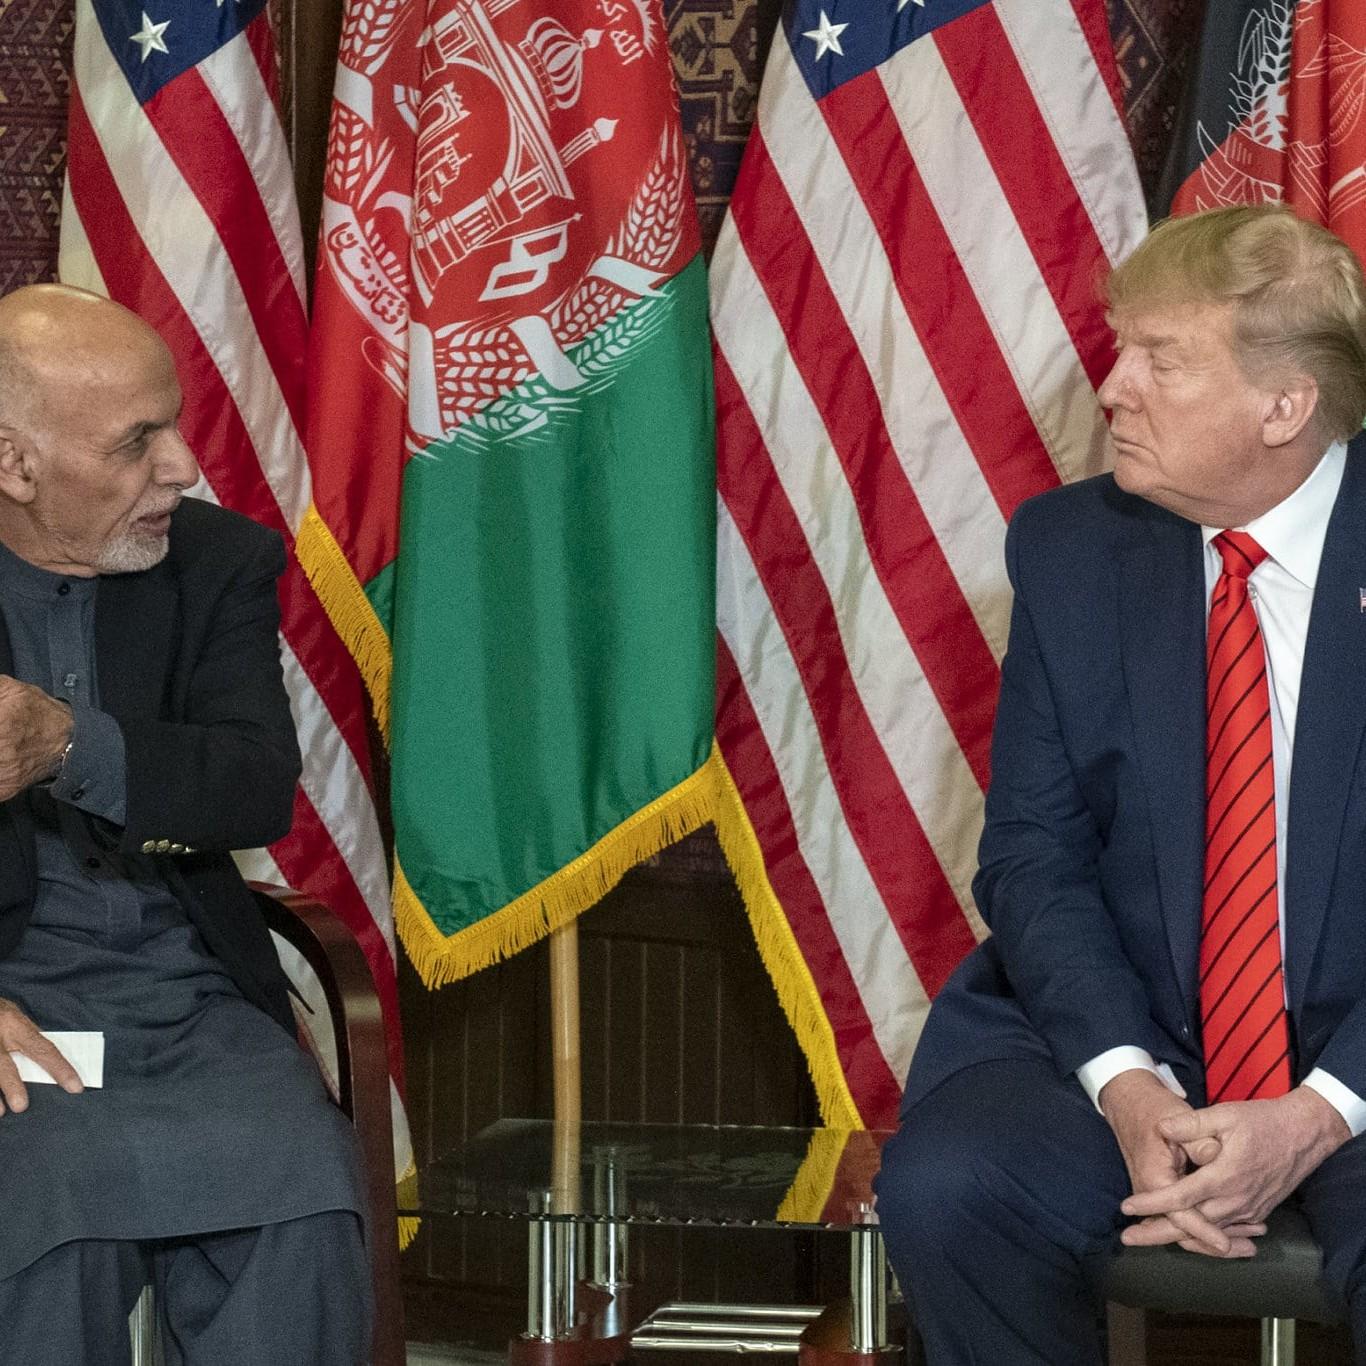 Le presunte taglie sui militari statunitensi in Afghanistan